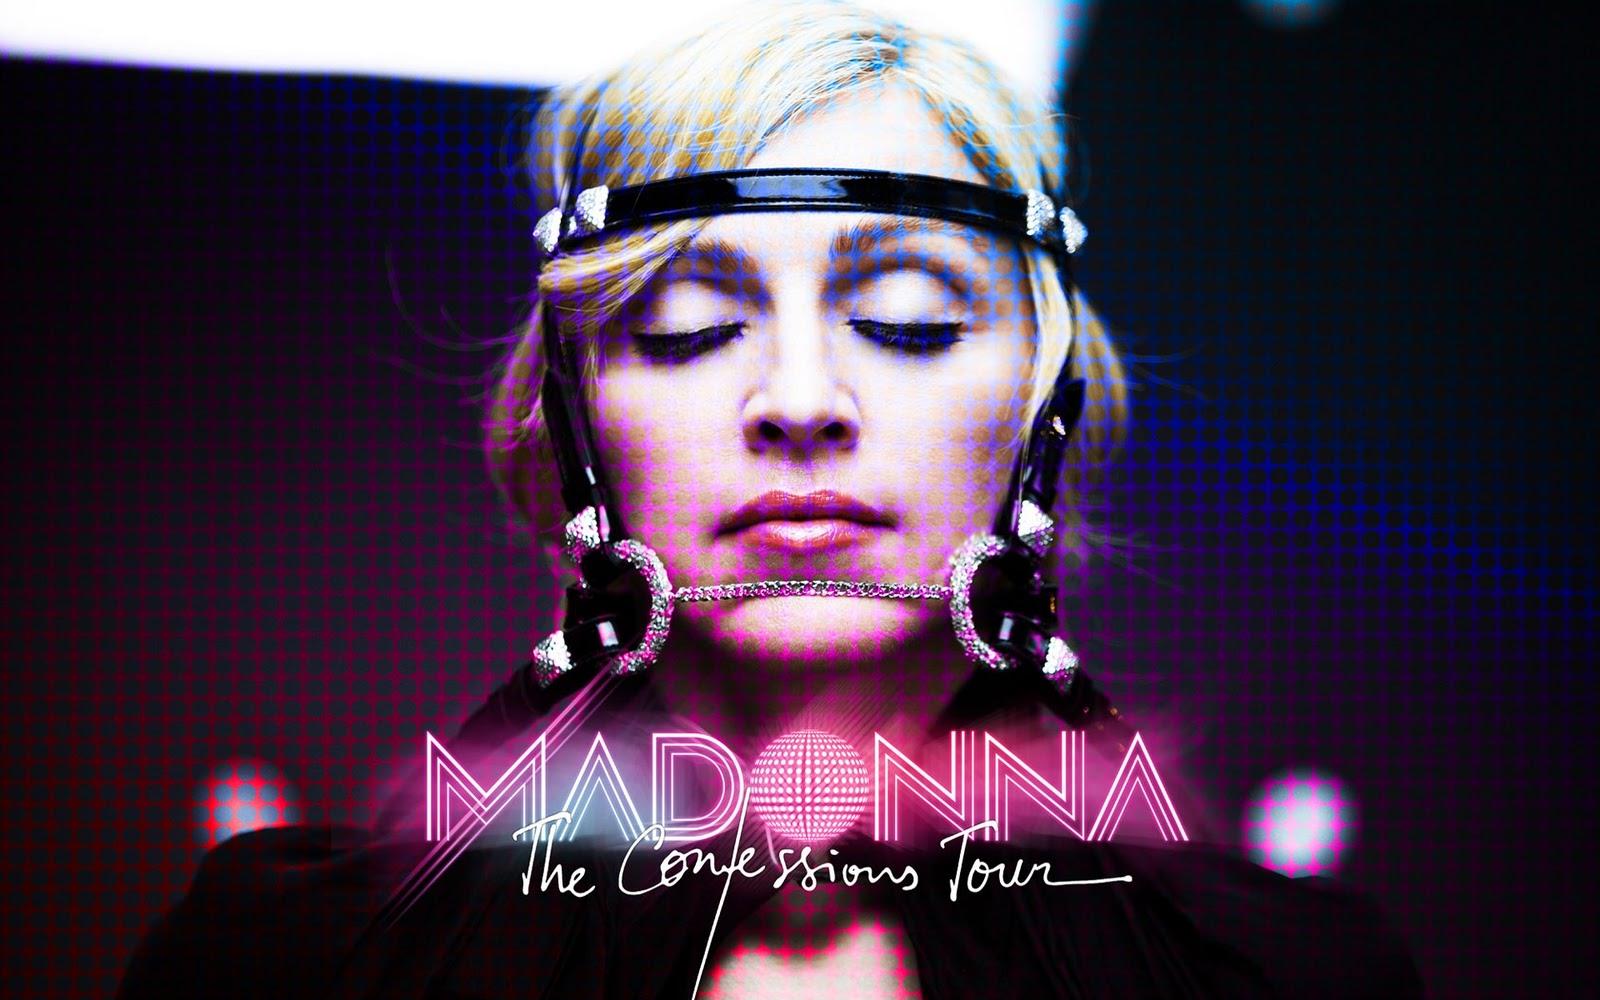 http://1.bp.blogspot.com/-WSyYR8iW98I/T6qA--1tT0I/AAAAAAAAGA4/COuoYflwRZ8/s1600/madonna-confessions-tour.jpg